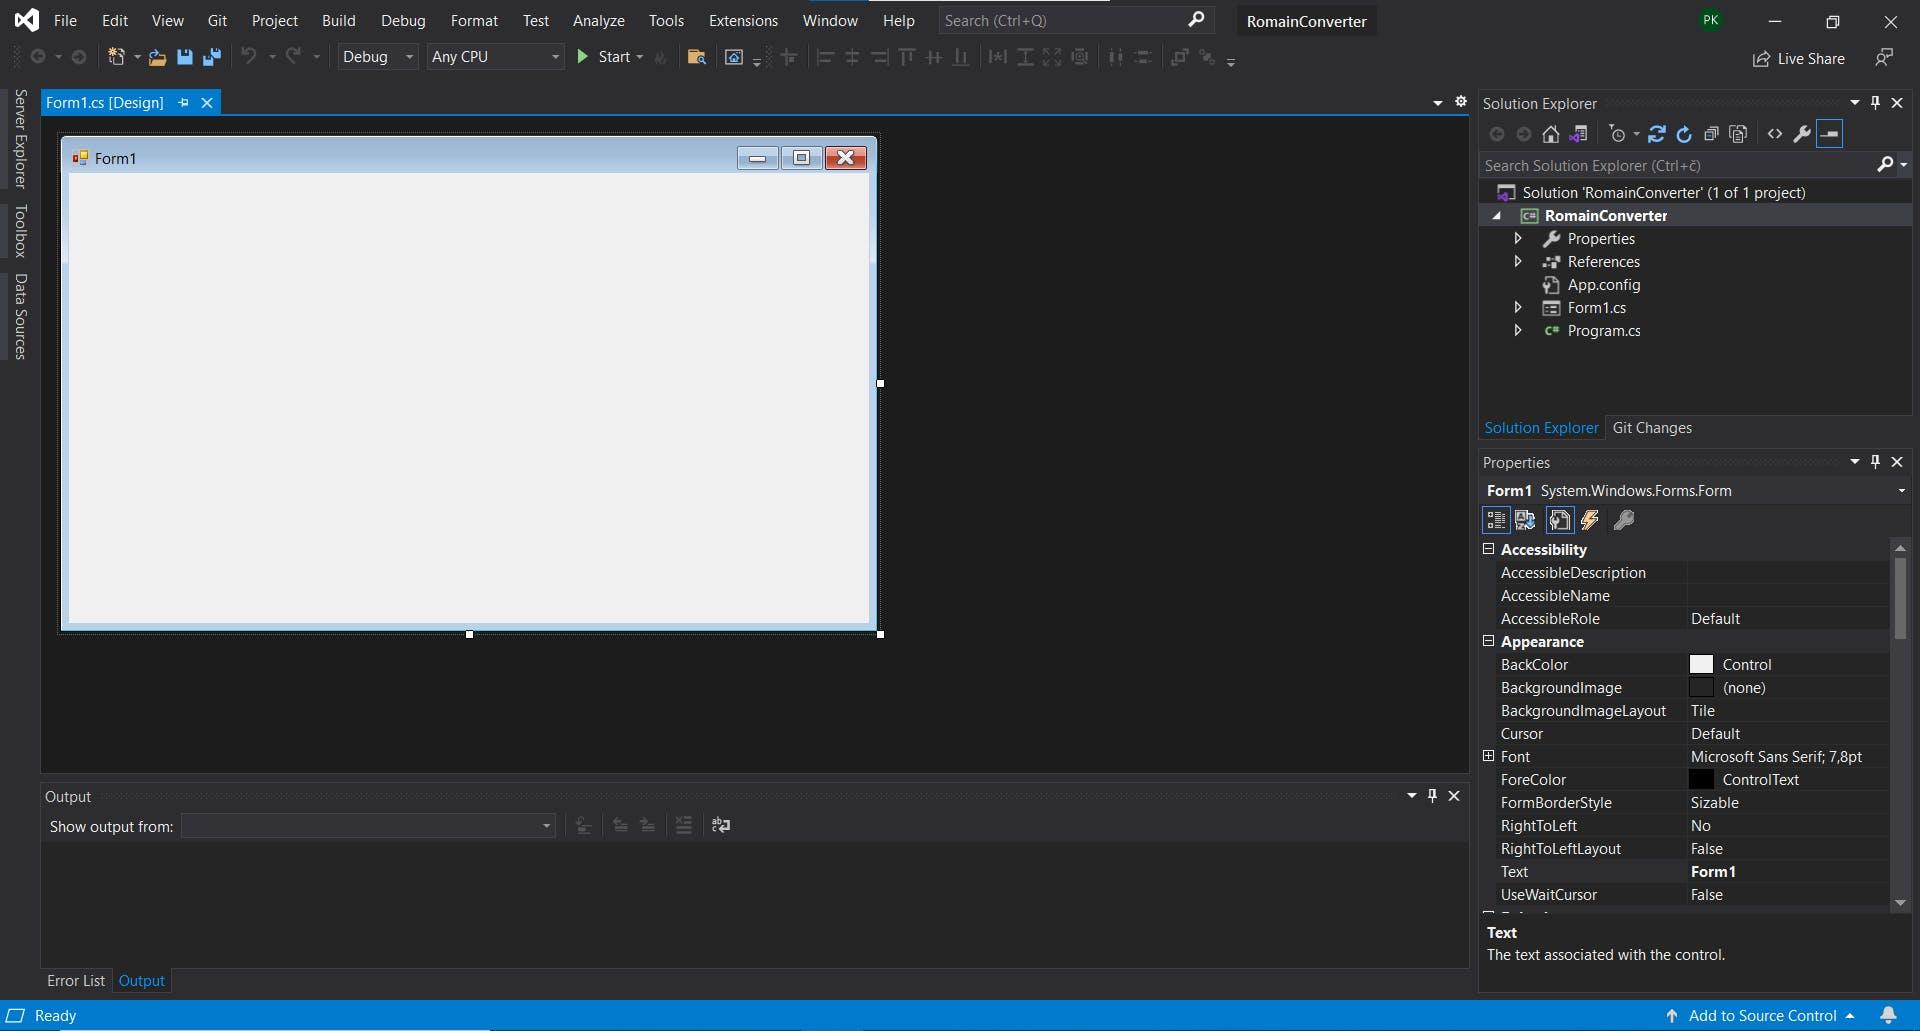 Main view of Visual Studio